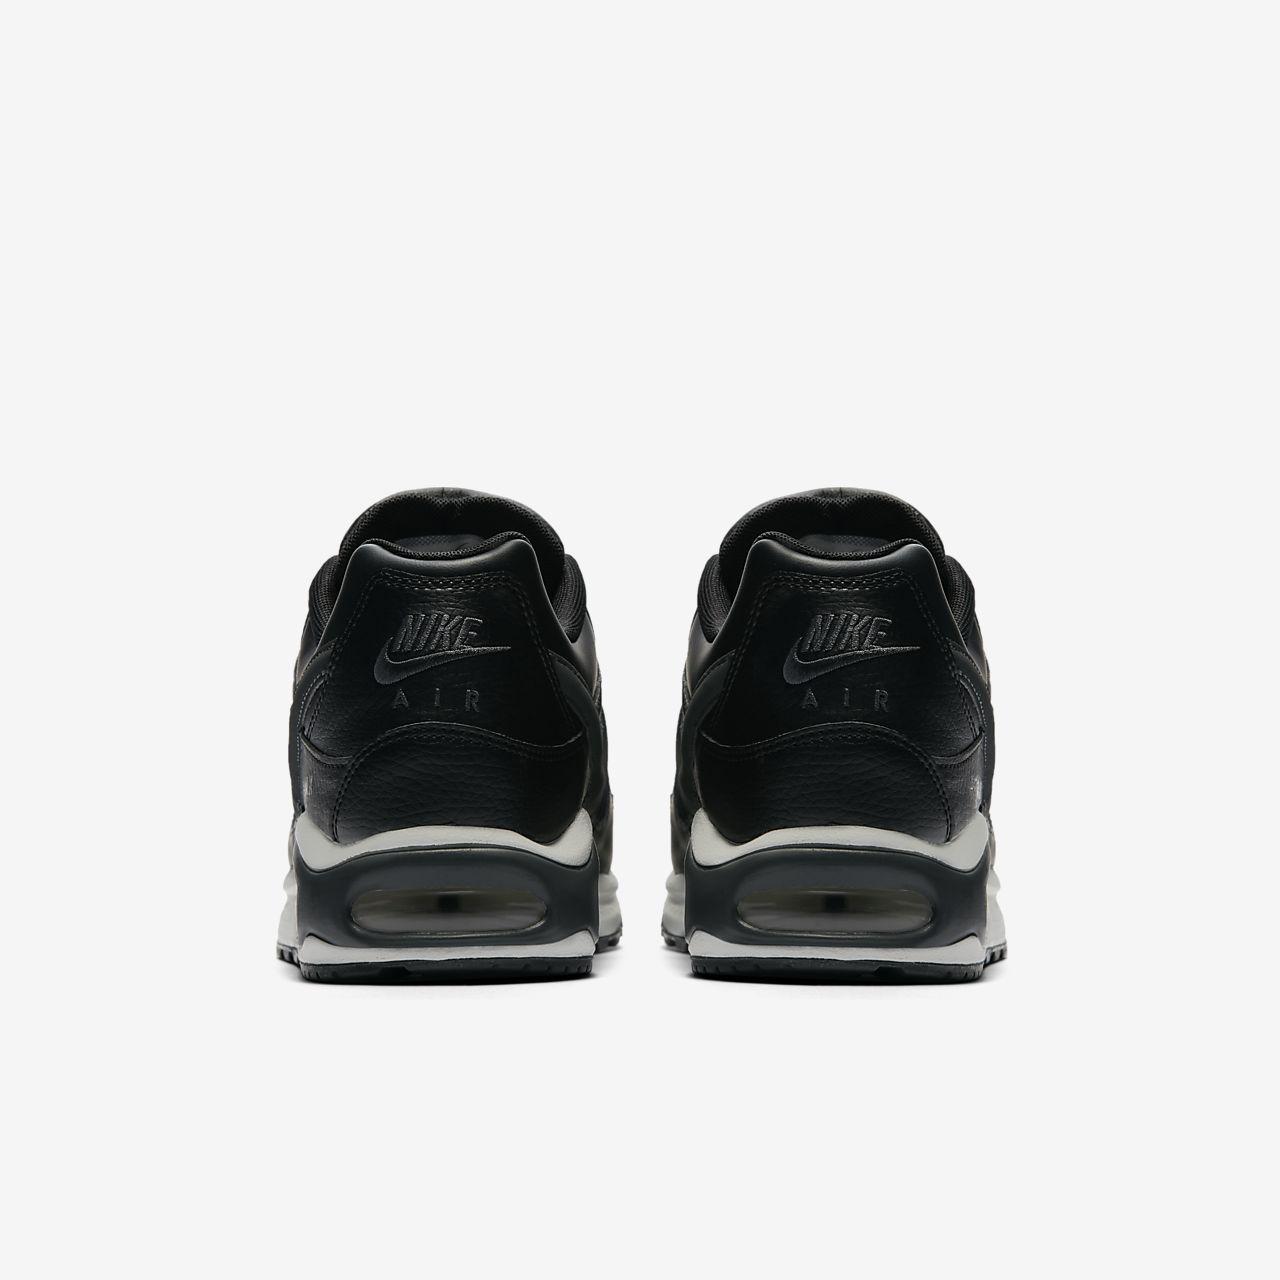 098a896f8bb Nike Air Max Command Men s Shoe. Nike.com GB